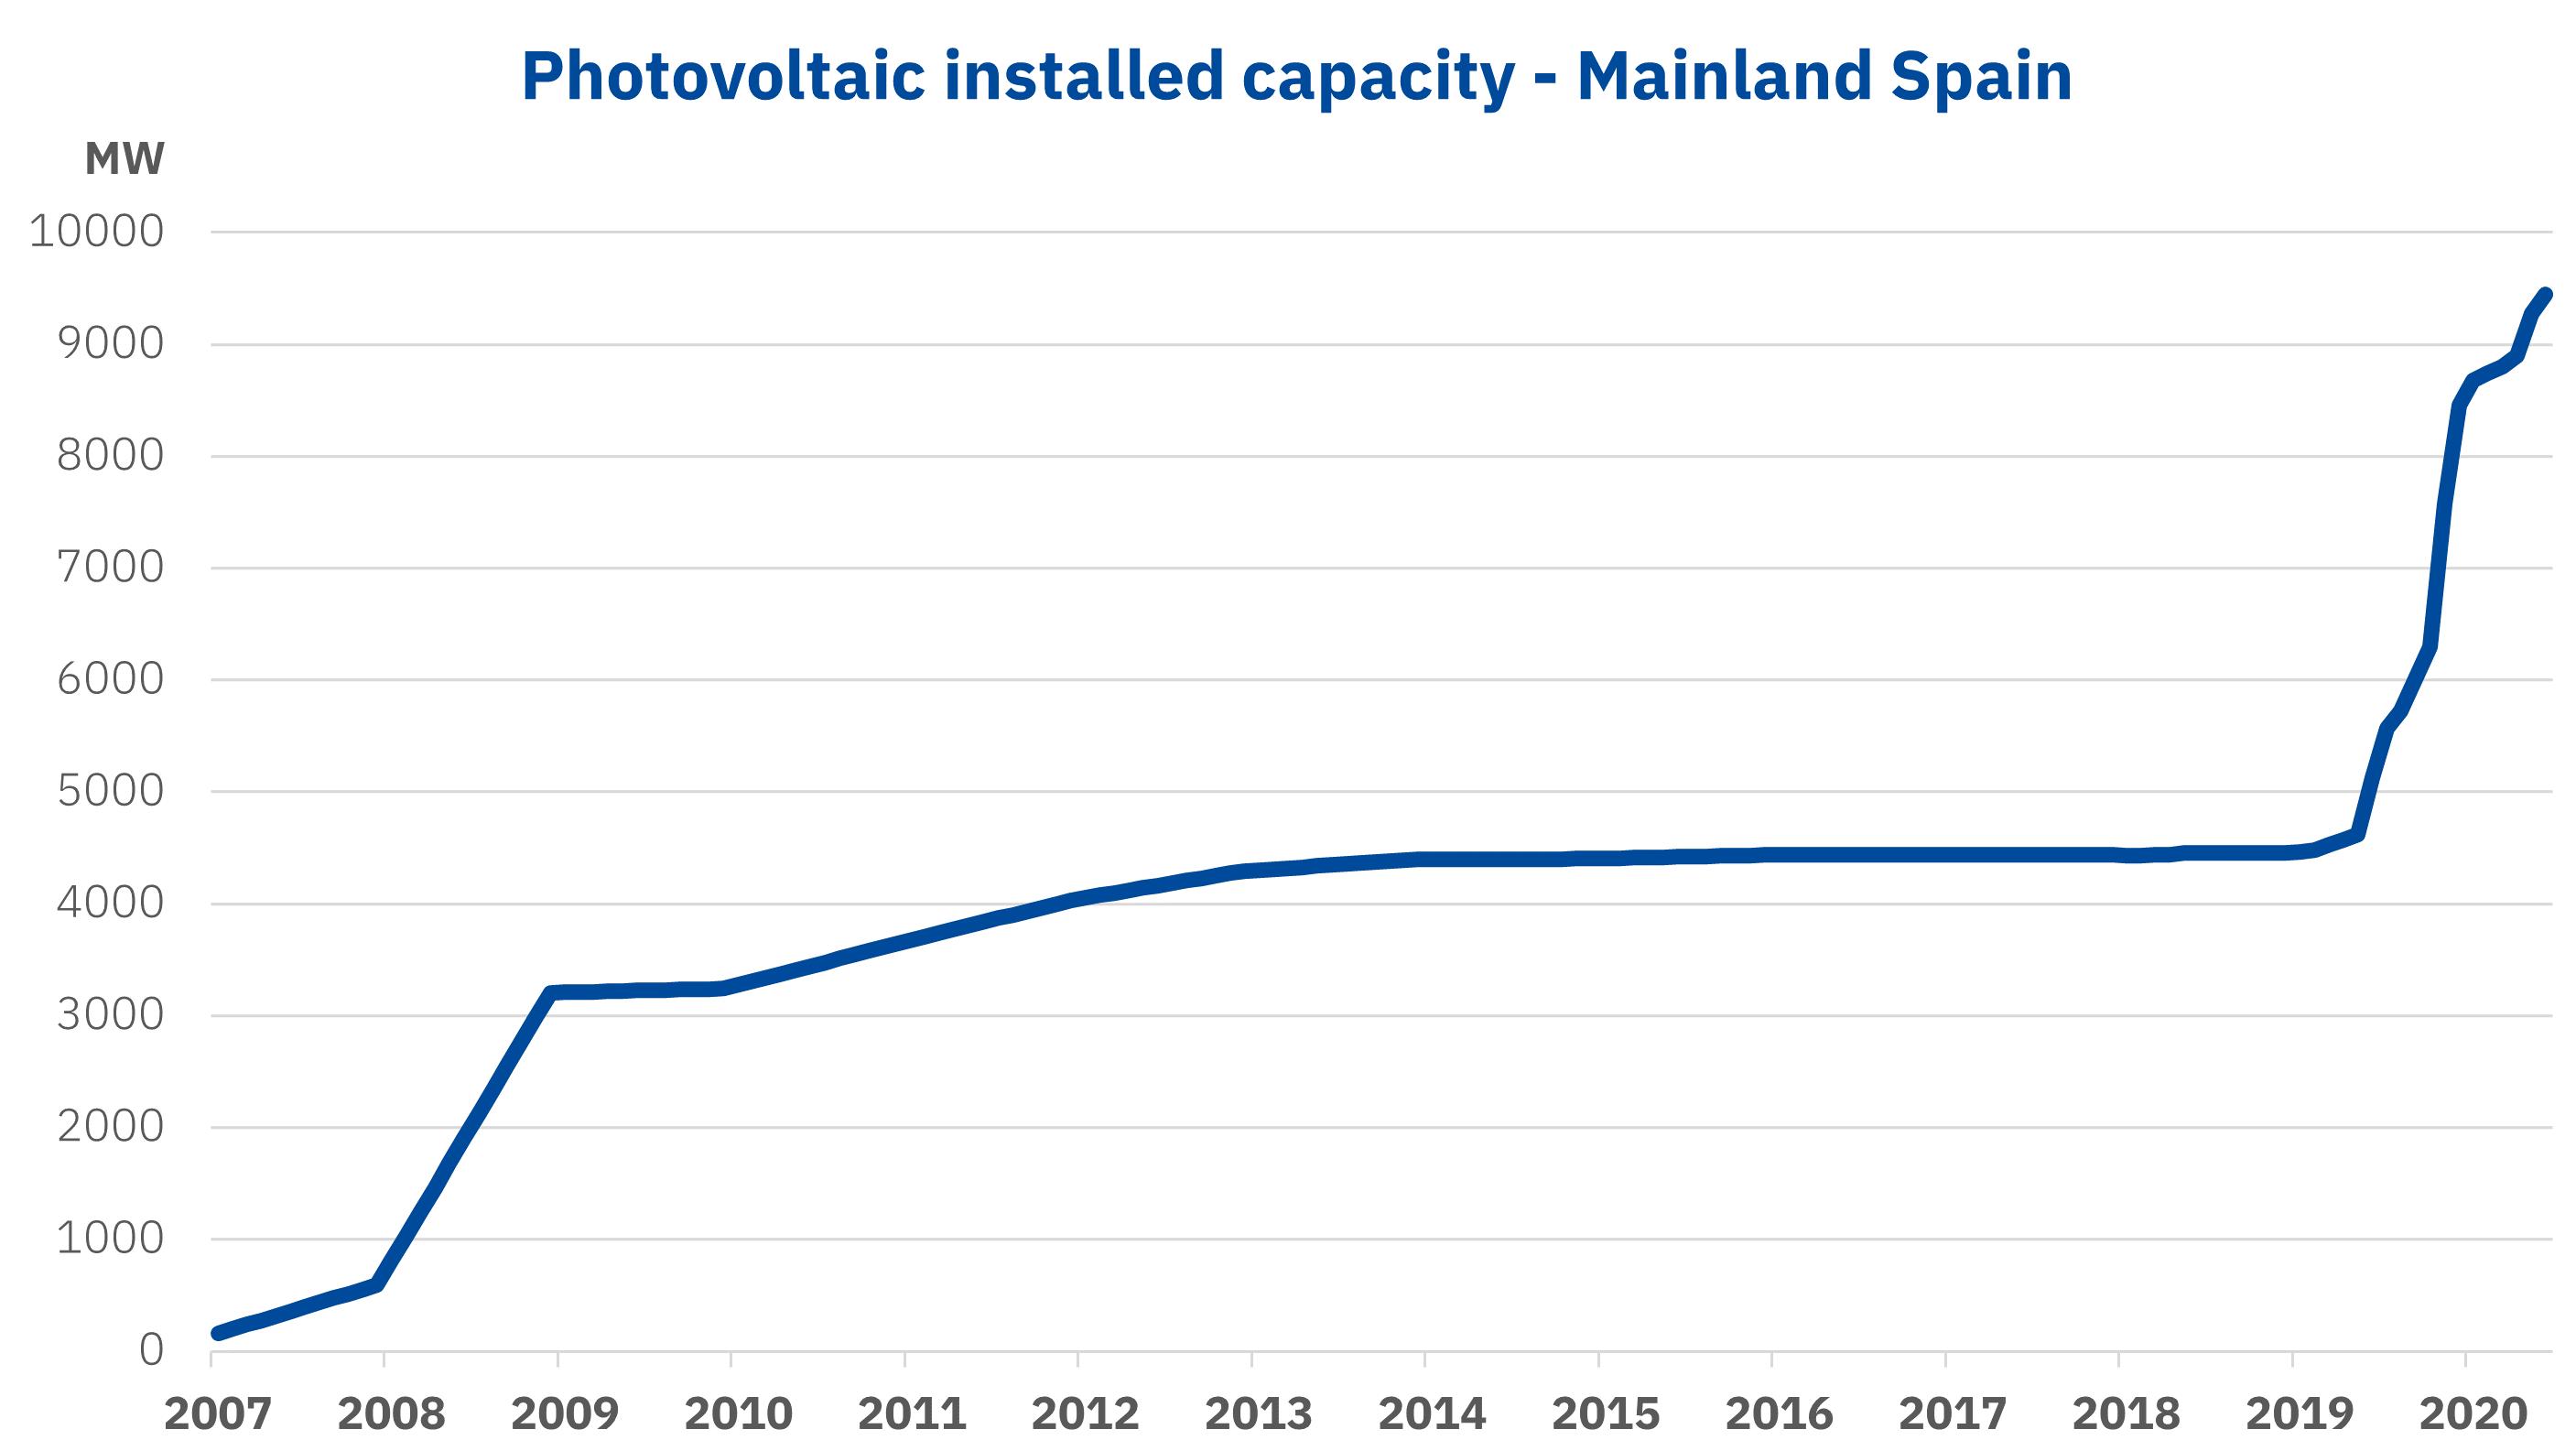 AleaSoft - Photovoltaic installed capcity Spain